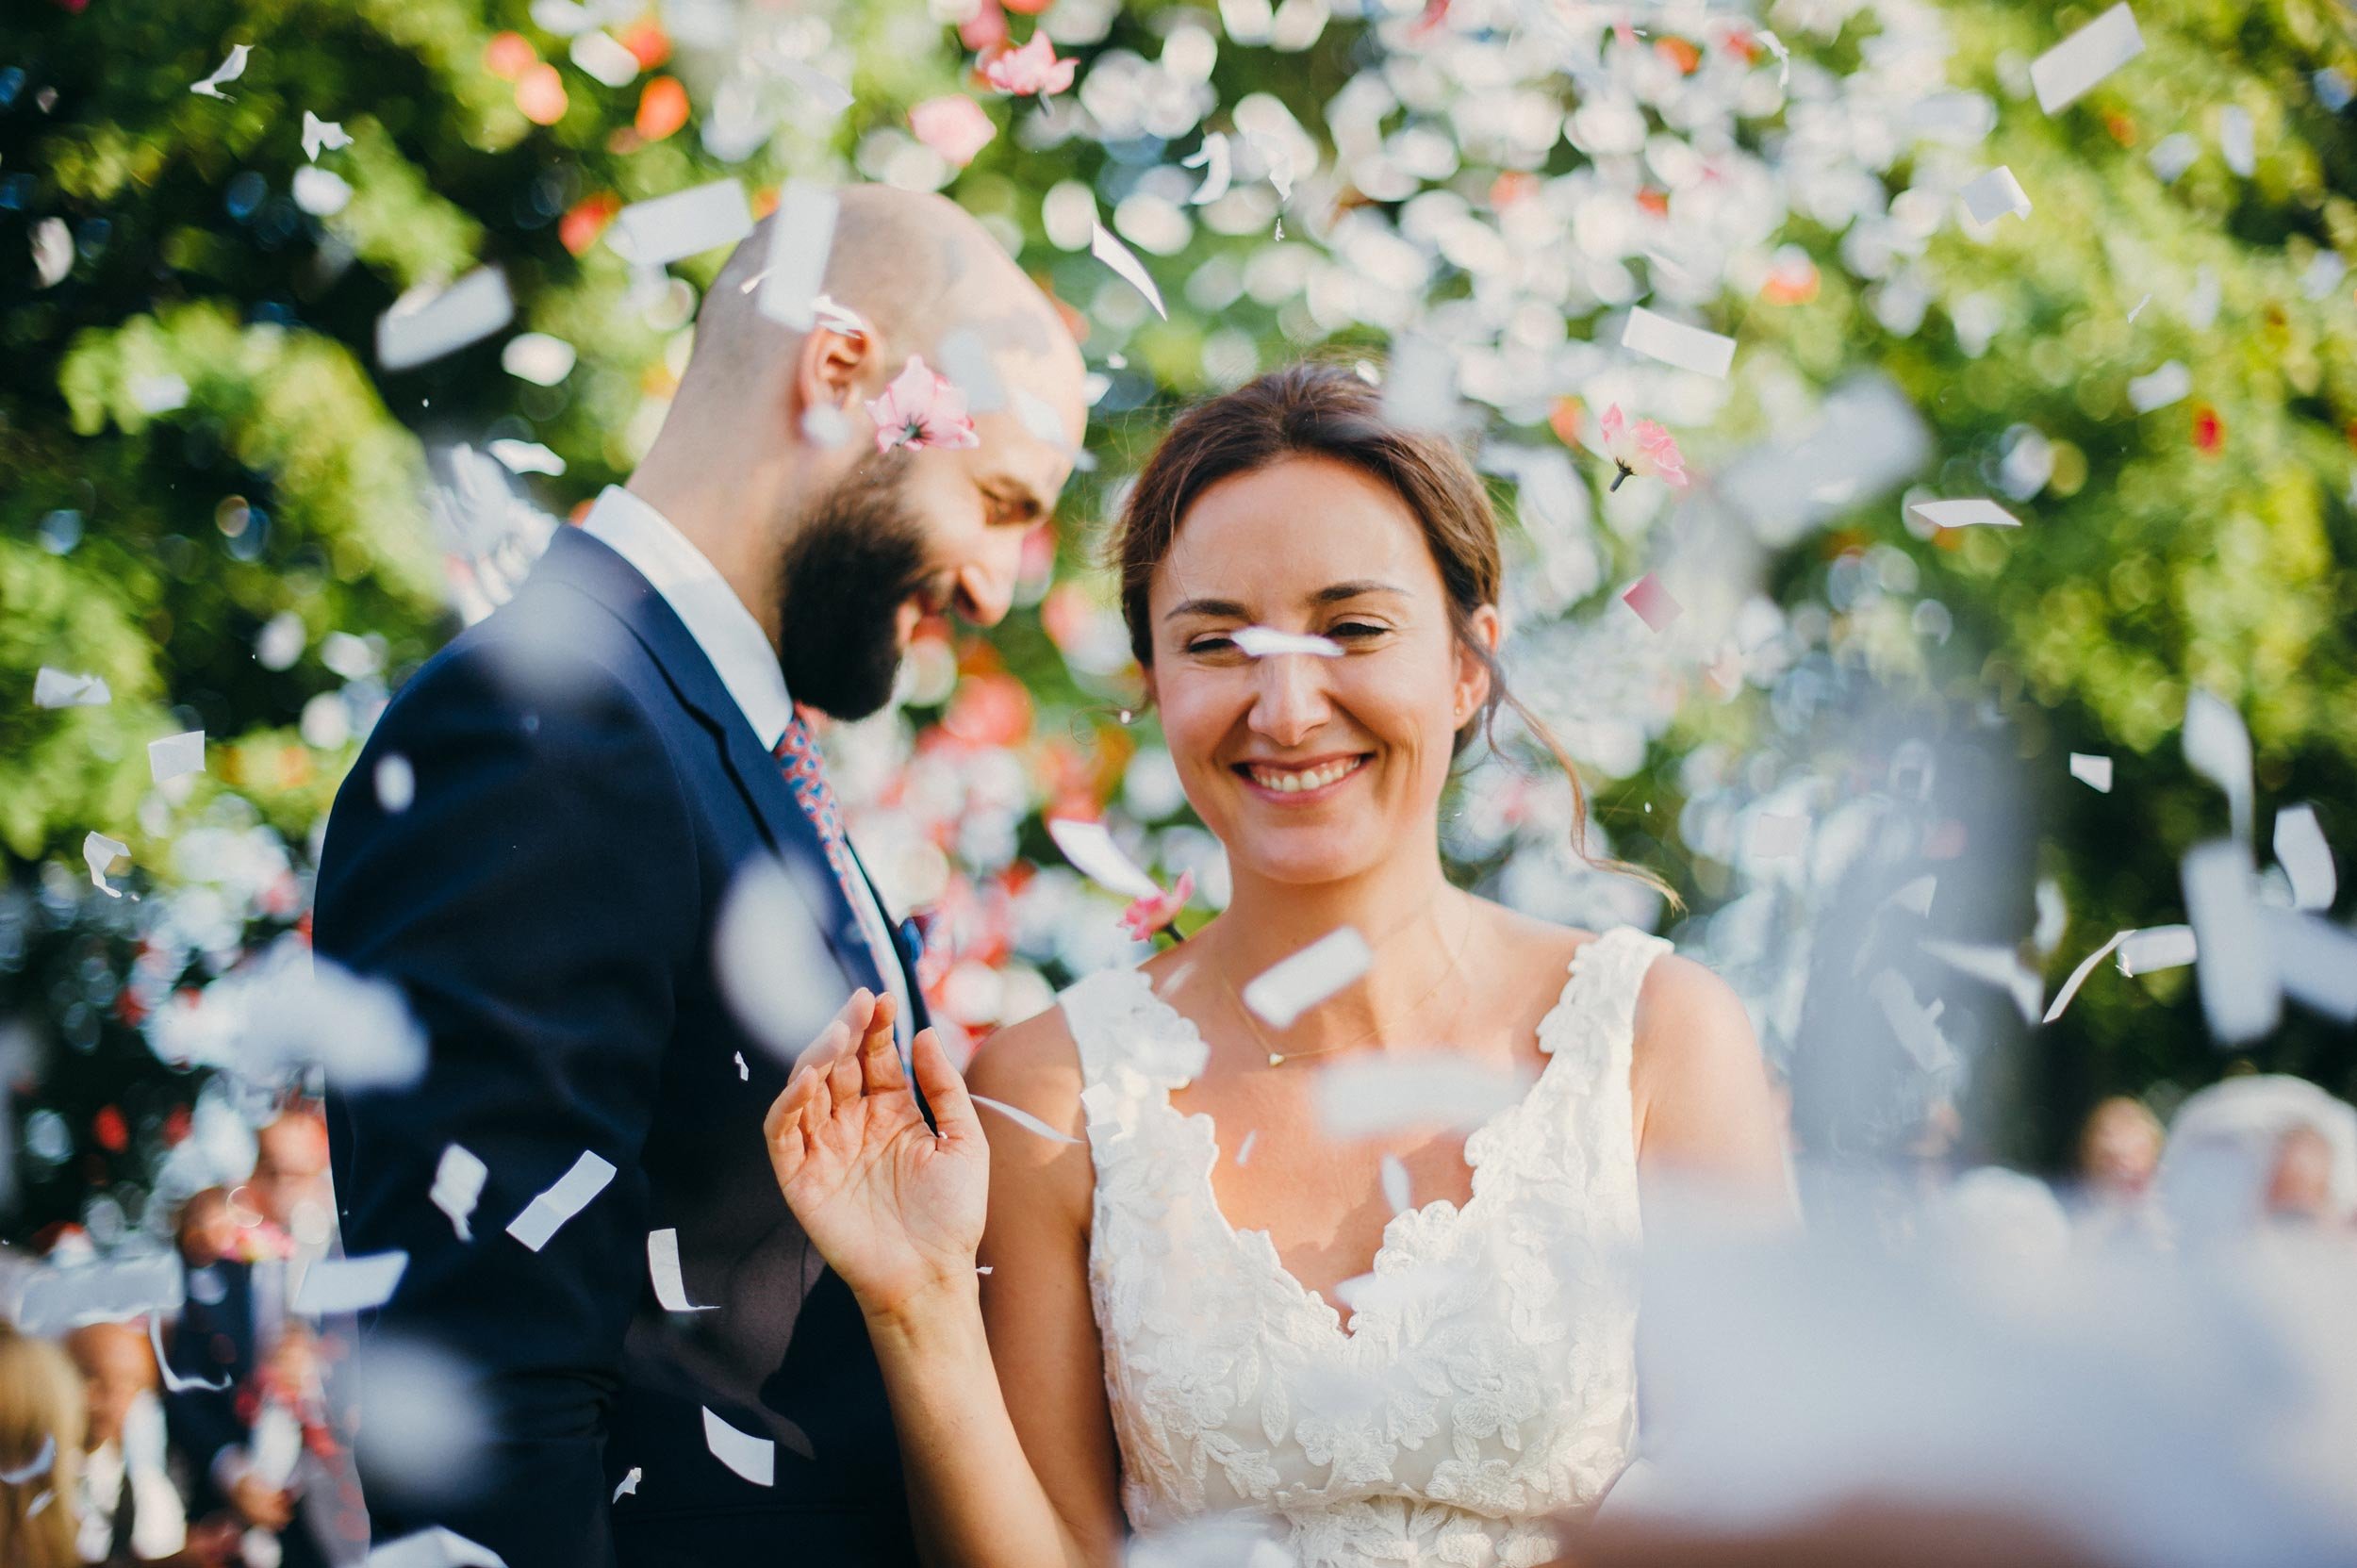 2016-Davor-Chiara-Monferrato-Asti-Vercelli-Wedding-Photographer-Italy-Alessandro-Avenali-34.jpg